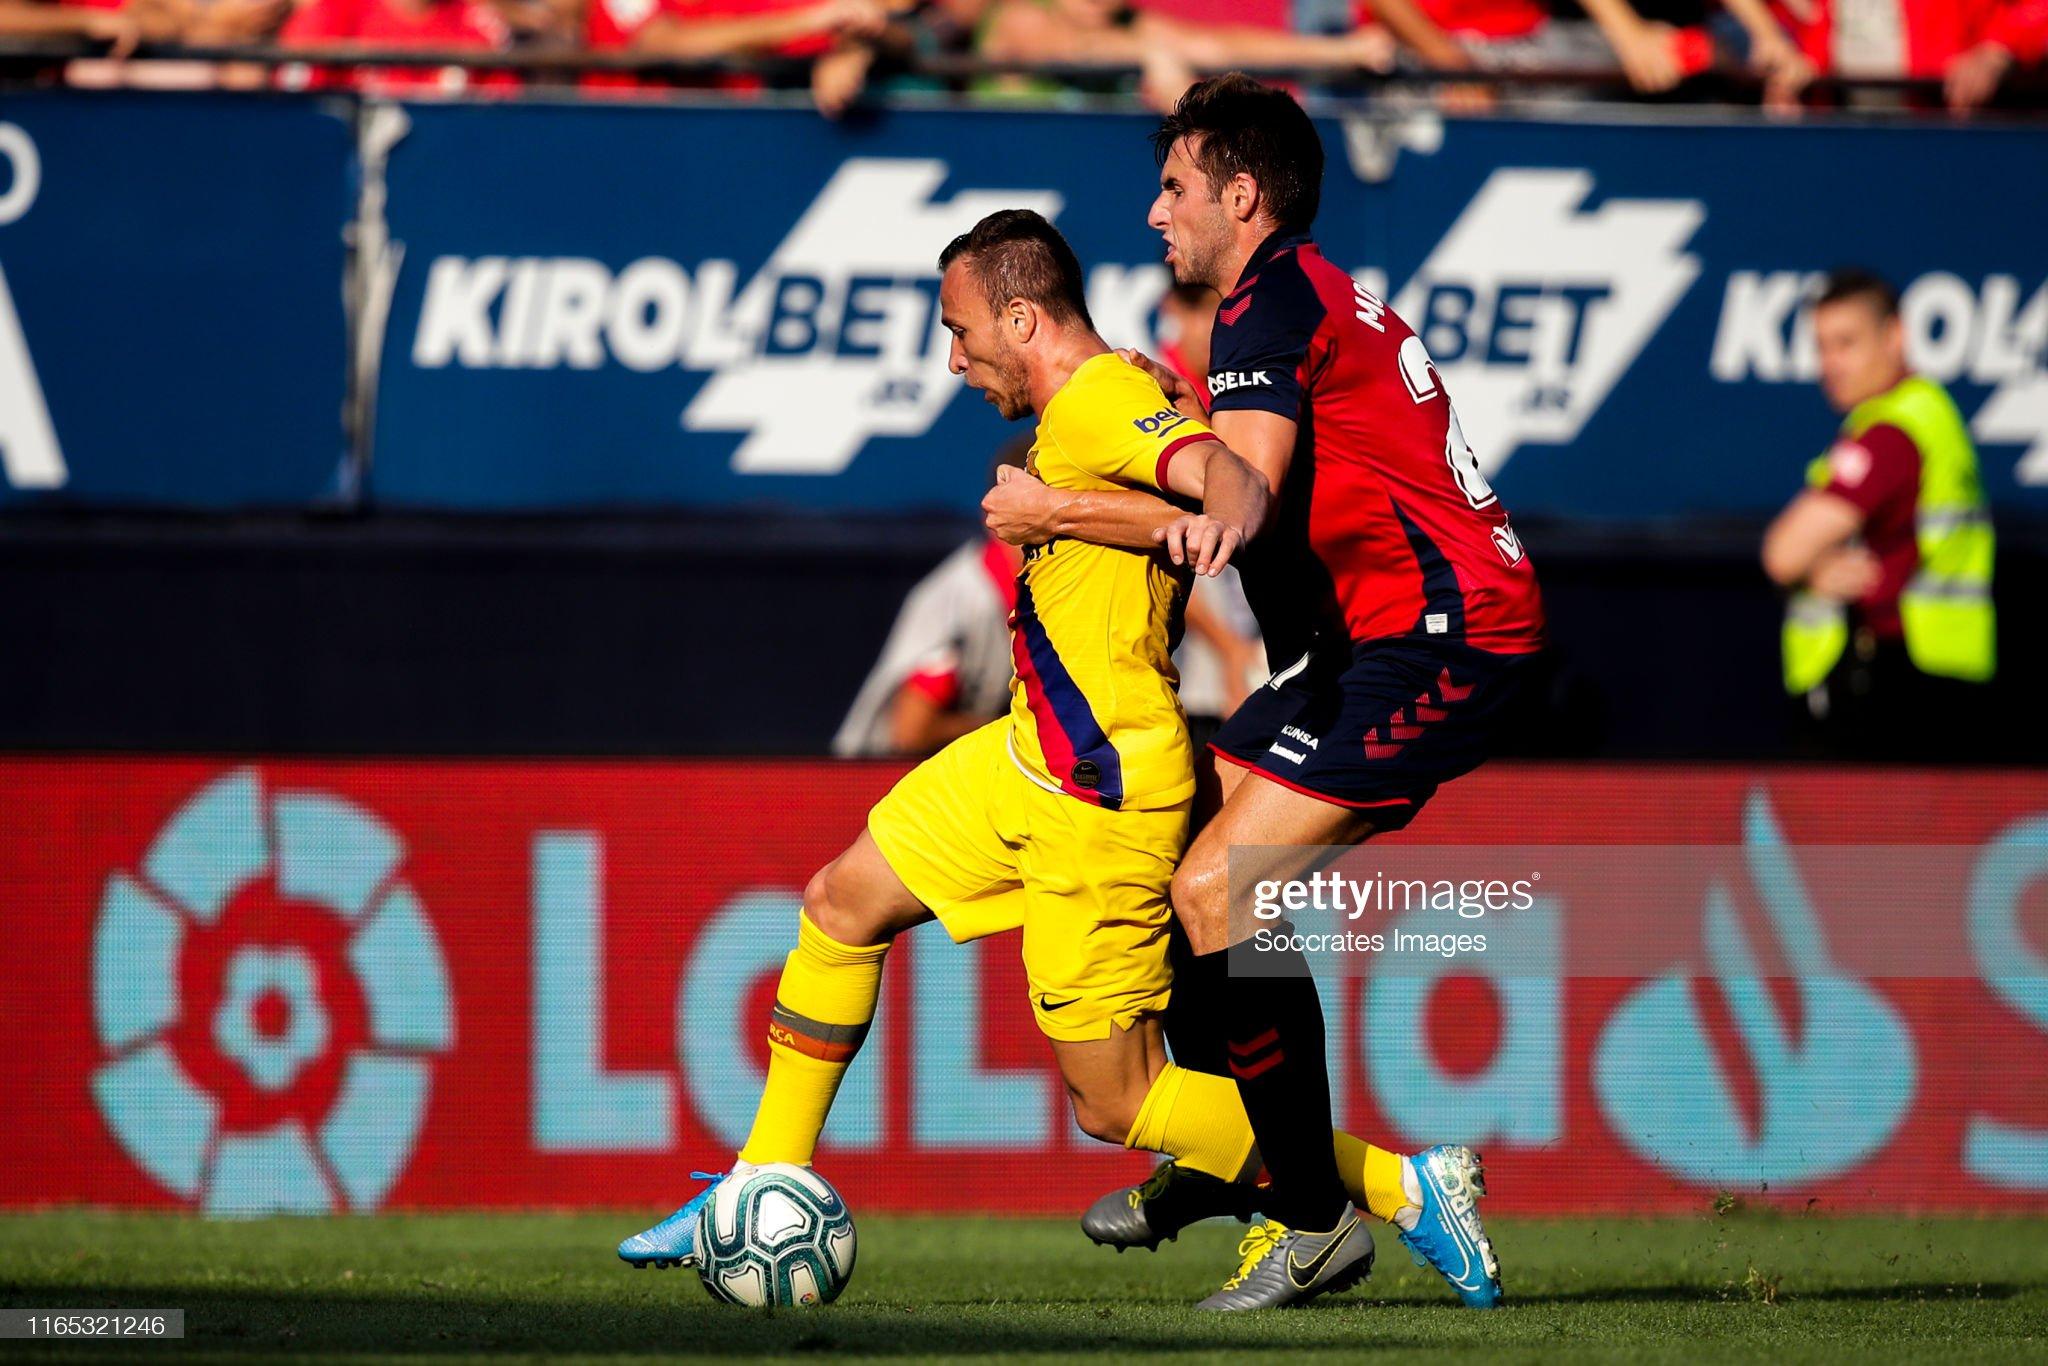 صور مباراة : أوساسونا - برشلونة 2-2 ( 31-08-2019 )  Arthur-of-fc-barcelona-nacho-vidal-of-ca-osasuna-during-the-la-liga-picture-id1165321246?s=2048x2048